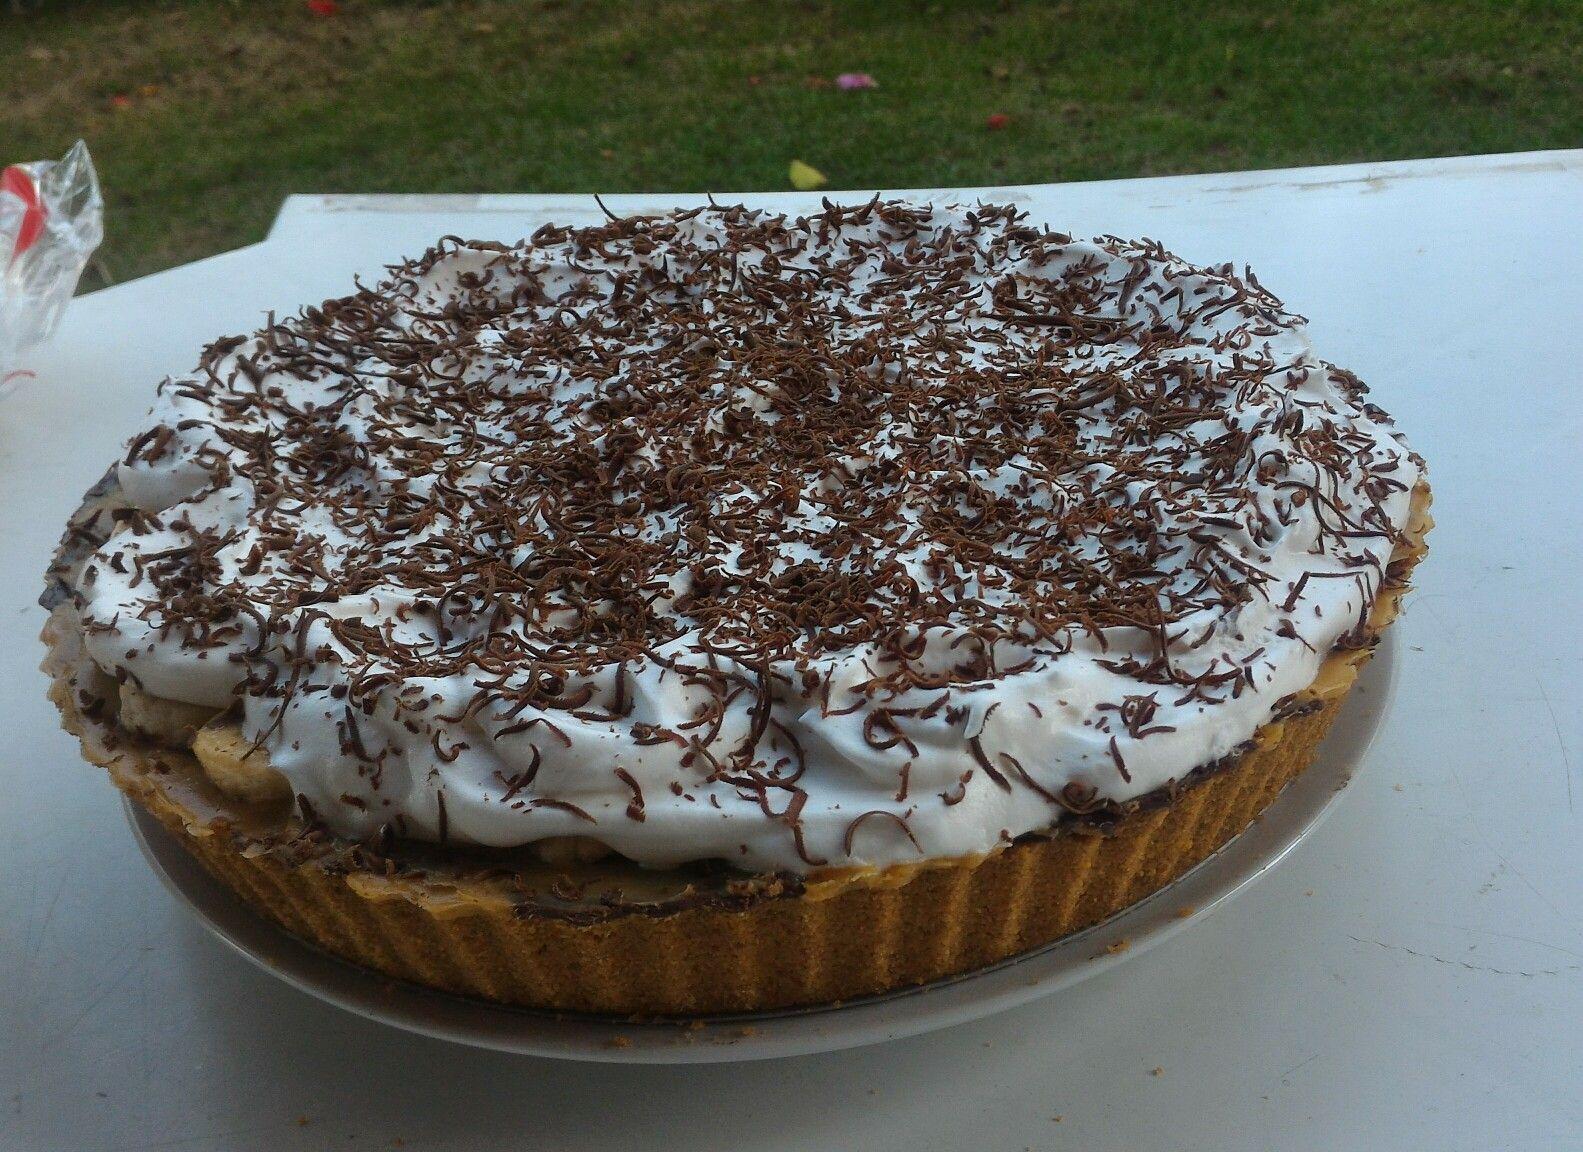 Bannoffe Pie. Extremamente deliciosa. Torta leve e nada enjoativa. Receita do ICKFD, By Daniele Noce.